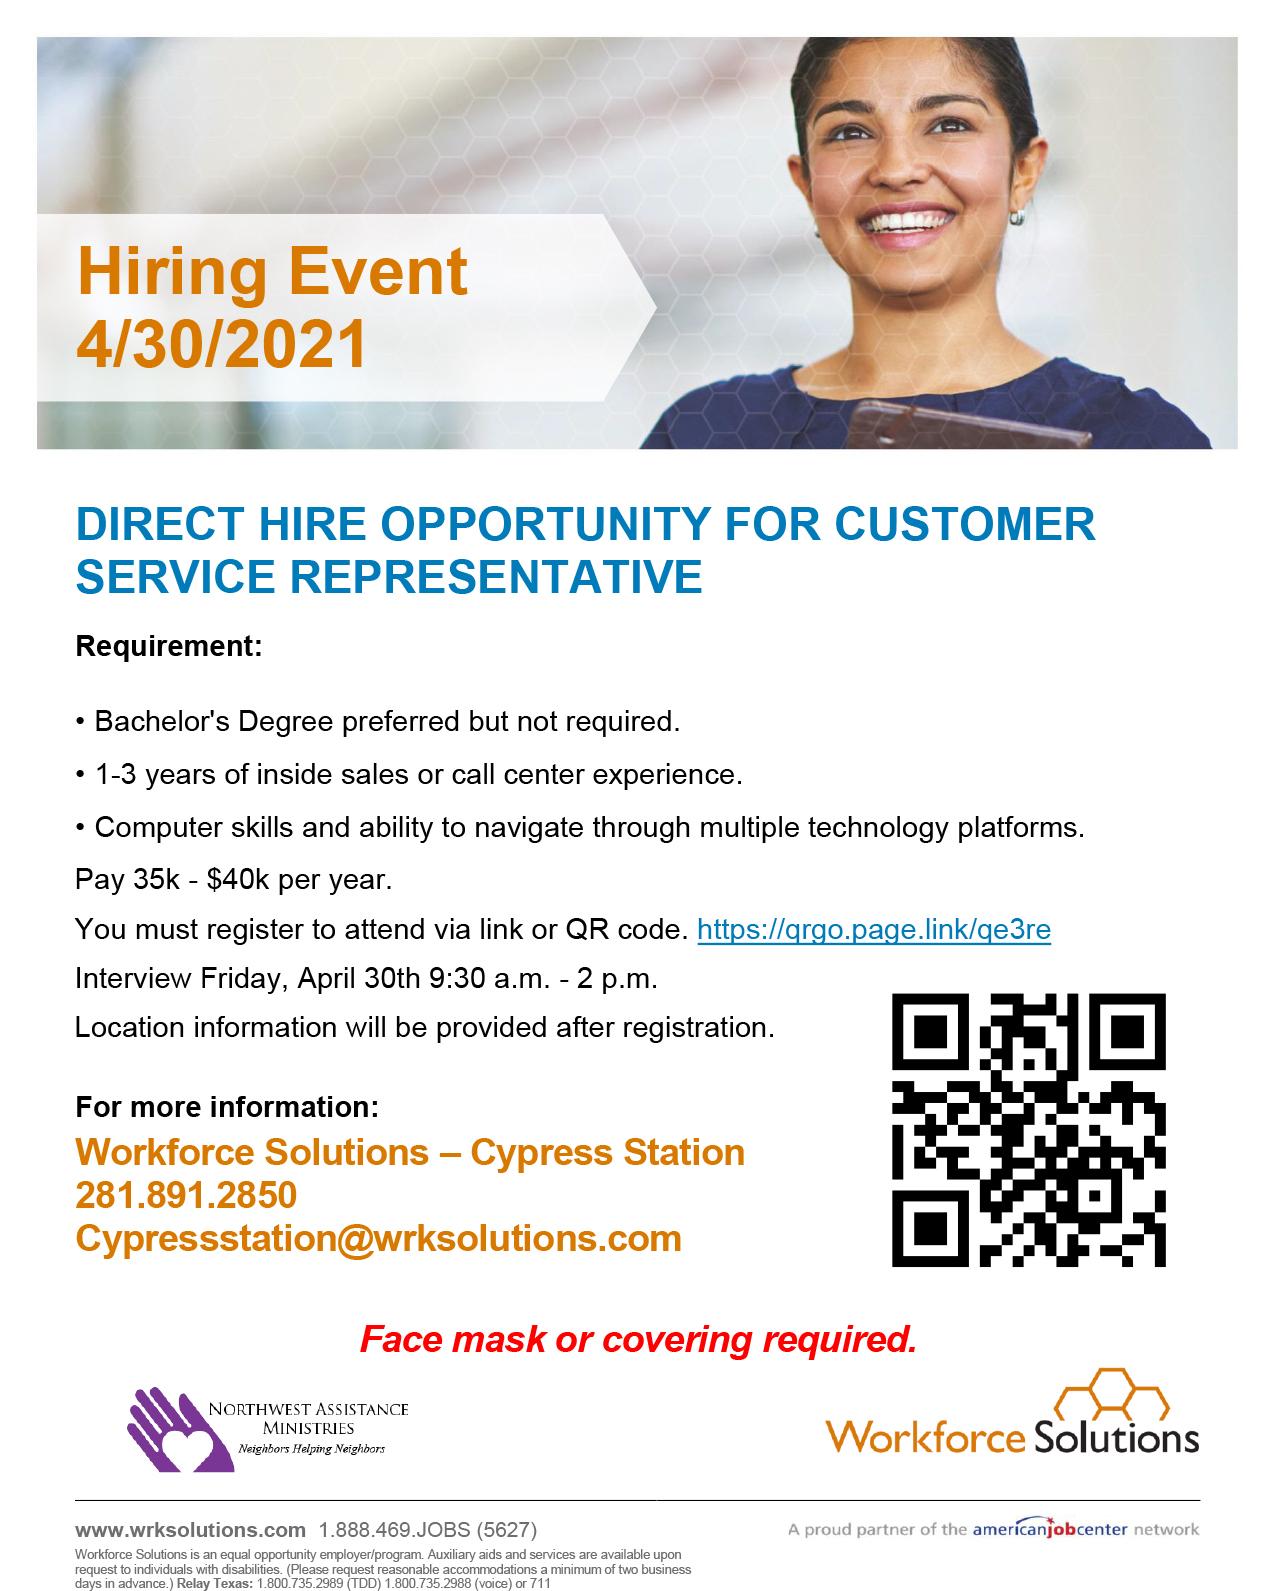 PP-NAM-Workforce_Solutions_Hiring_Event_Flyer.jpg